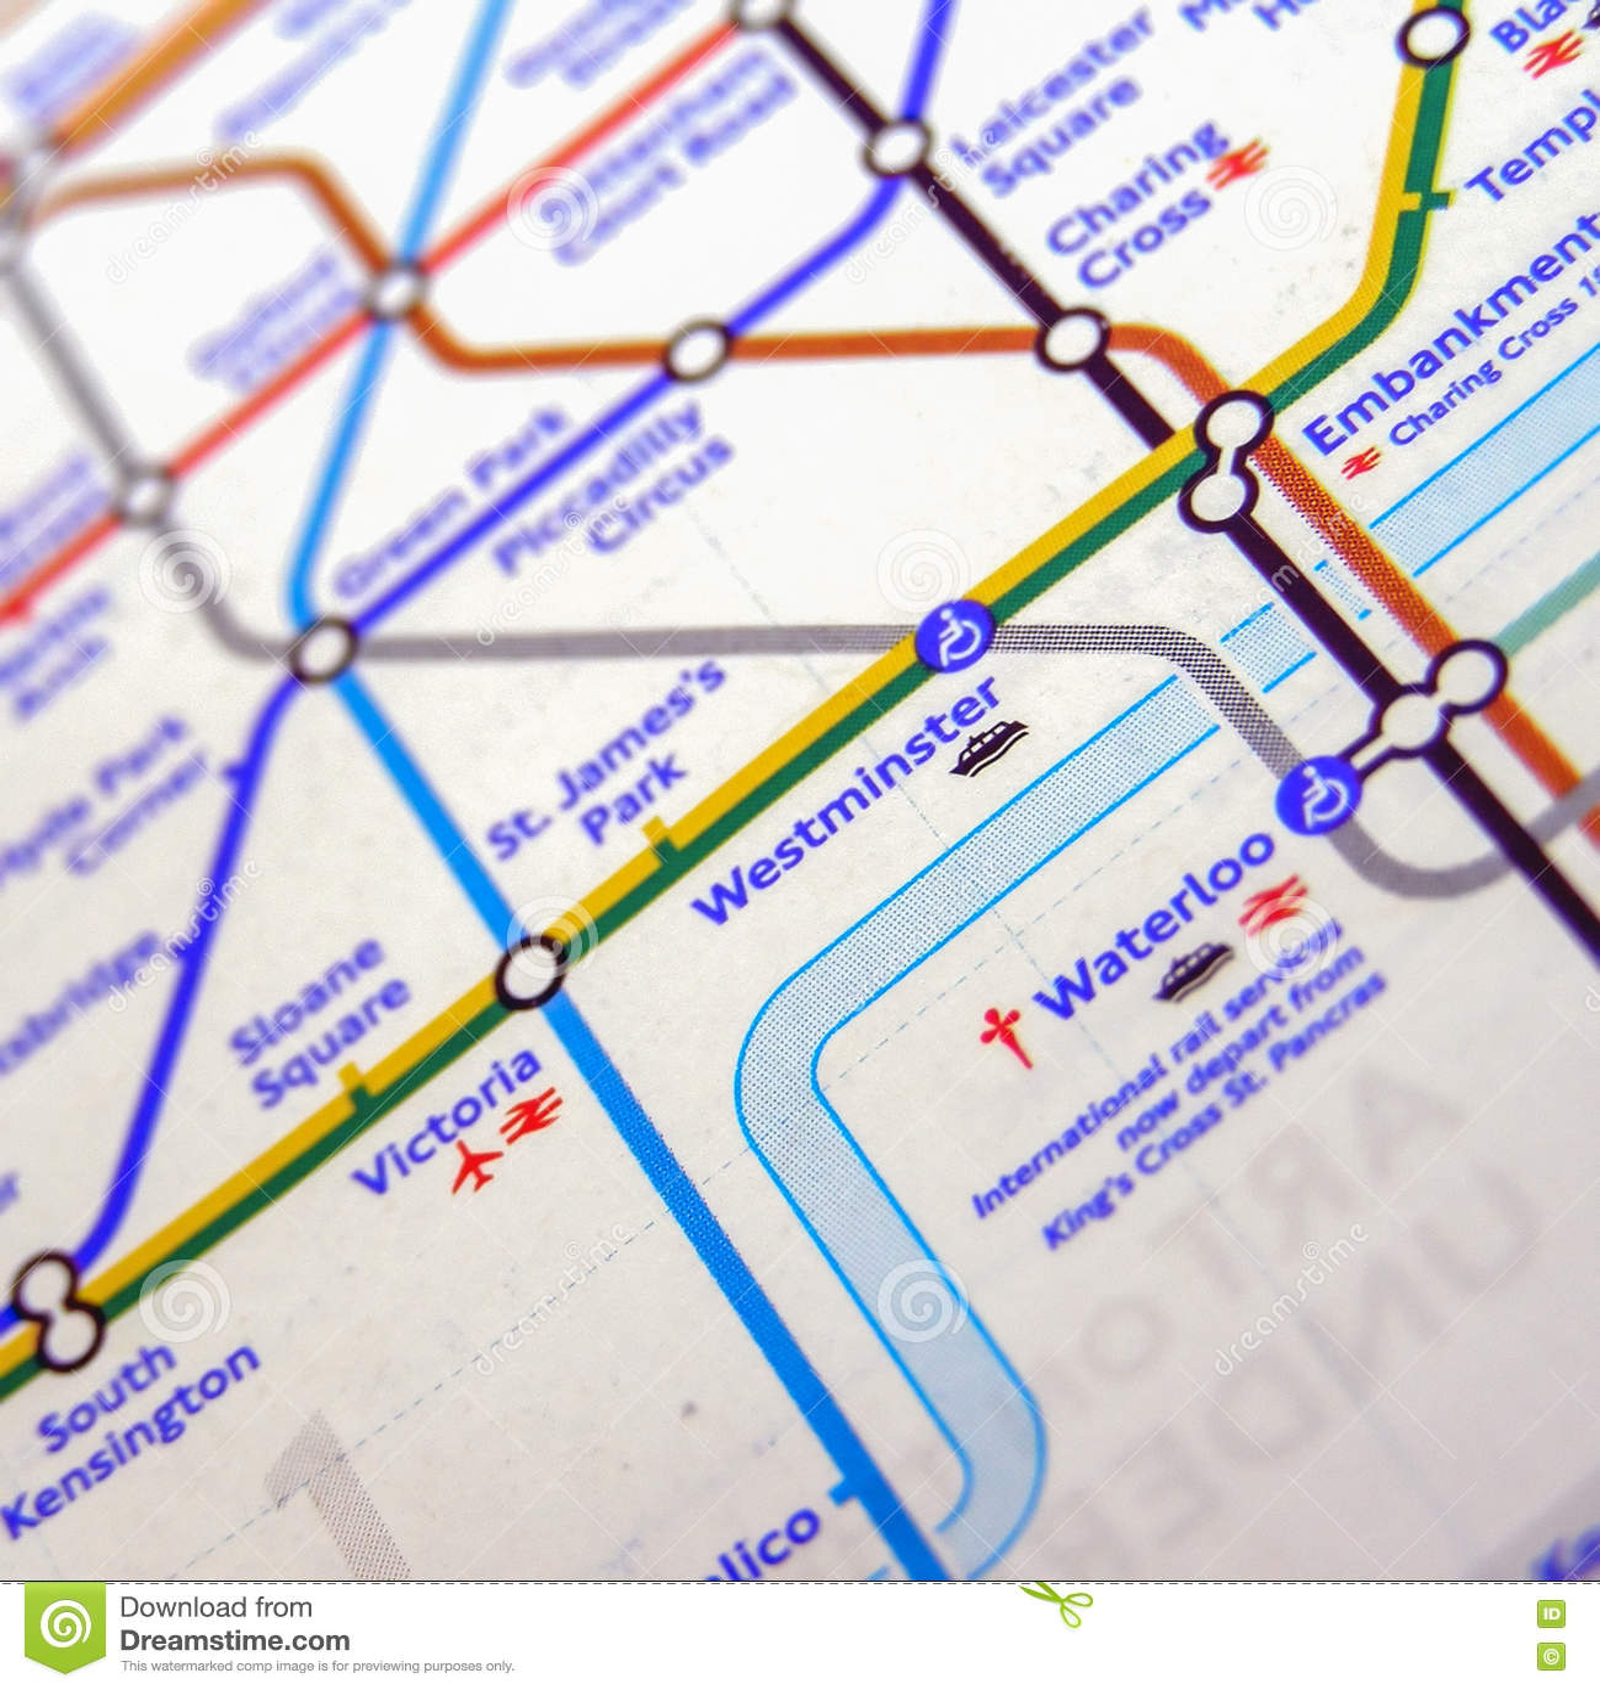 Map Subway London.Tube Map Of London Underground Editorial Stock Photo Image Of